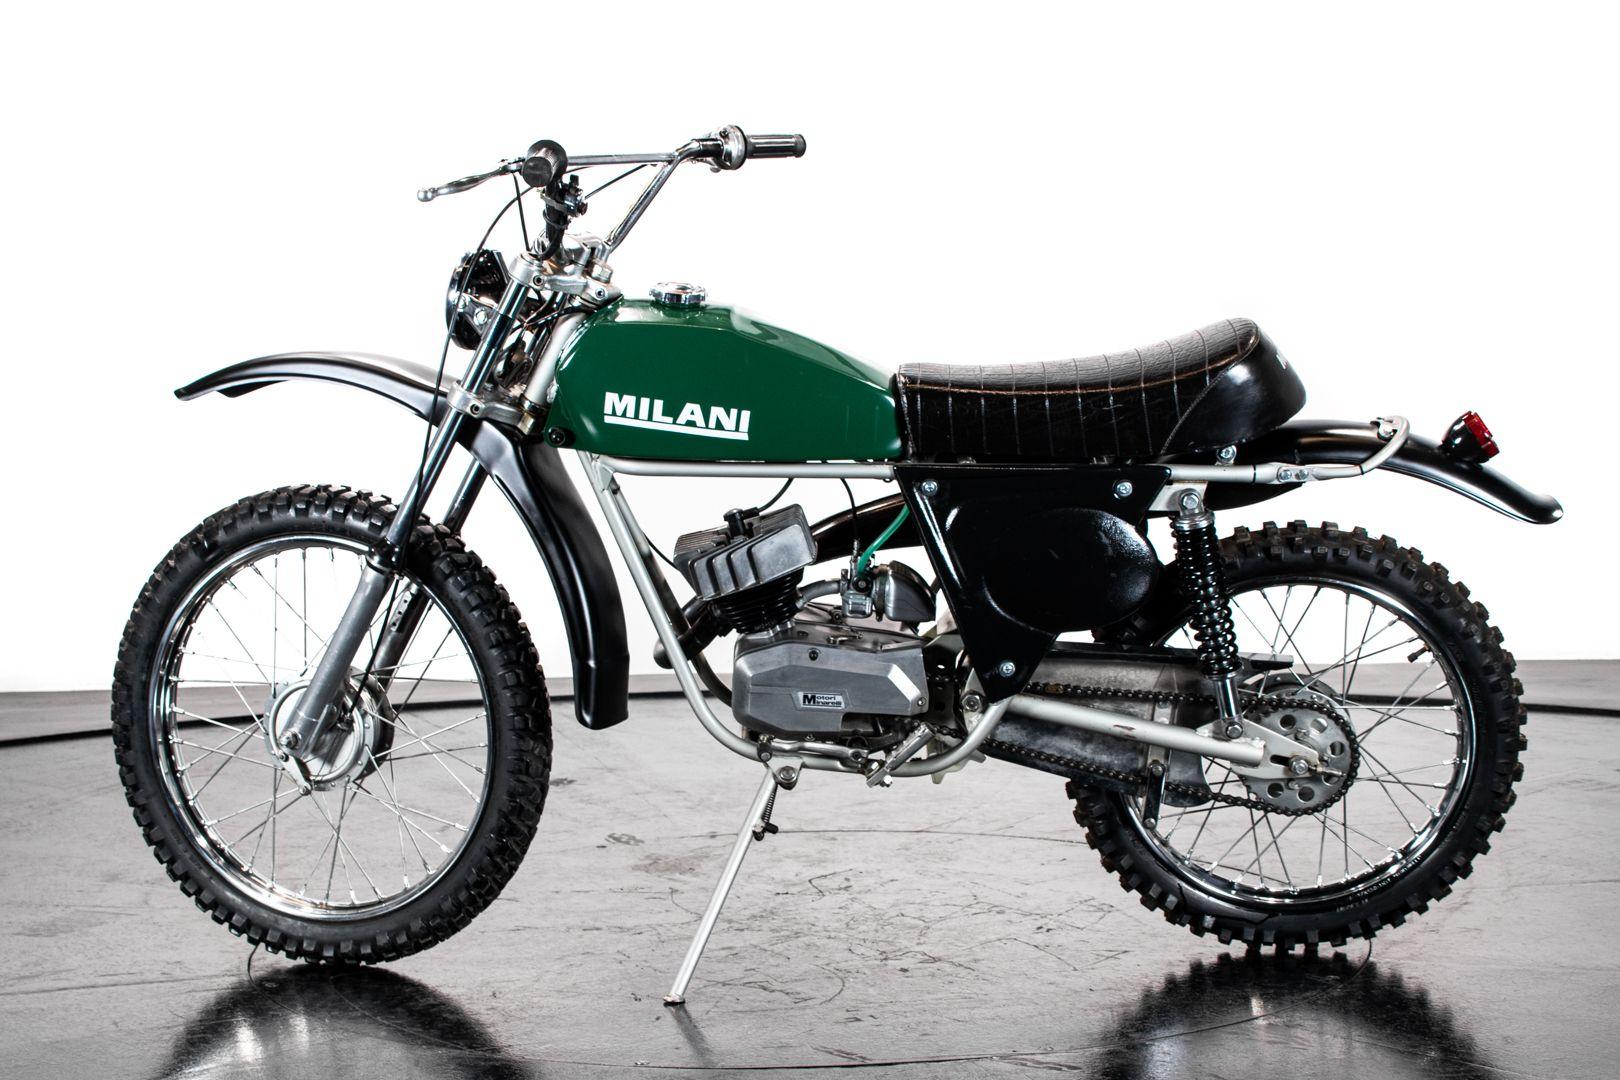 1975 Milani Cross 50 64337